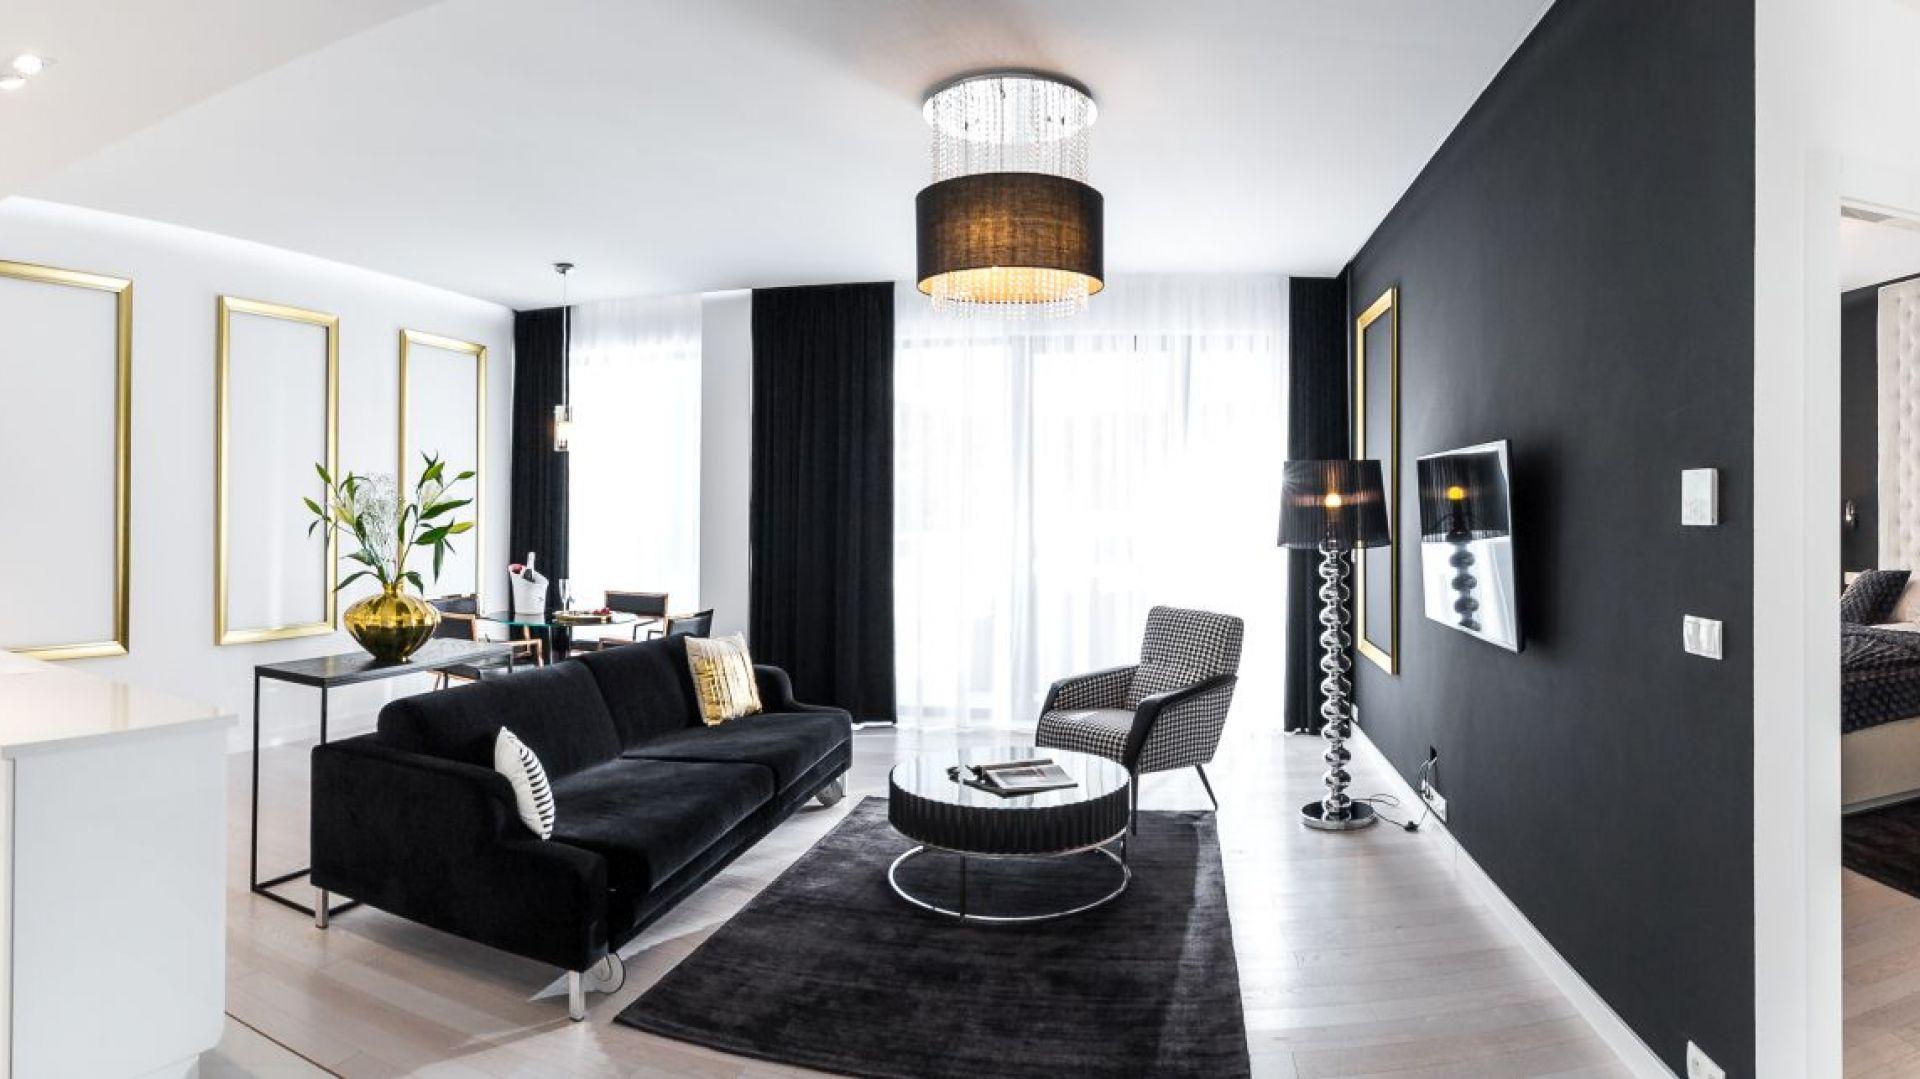 Dune Mielno Apartments. Fot. Alla Boroń (Studio Prototypownia)